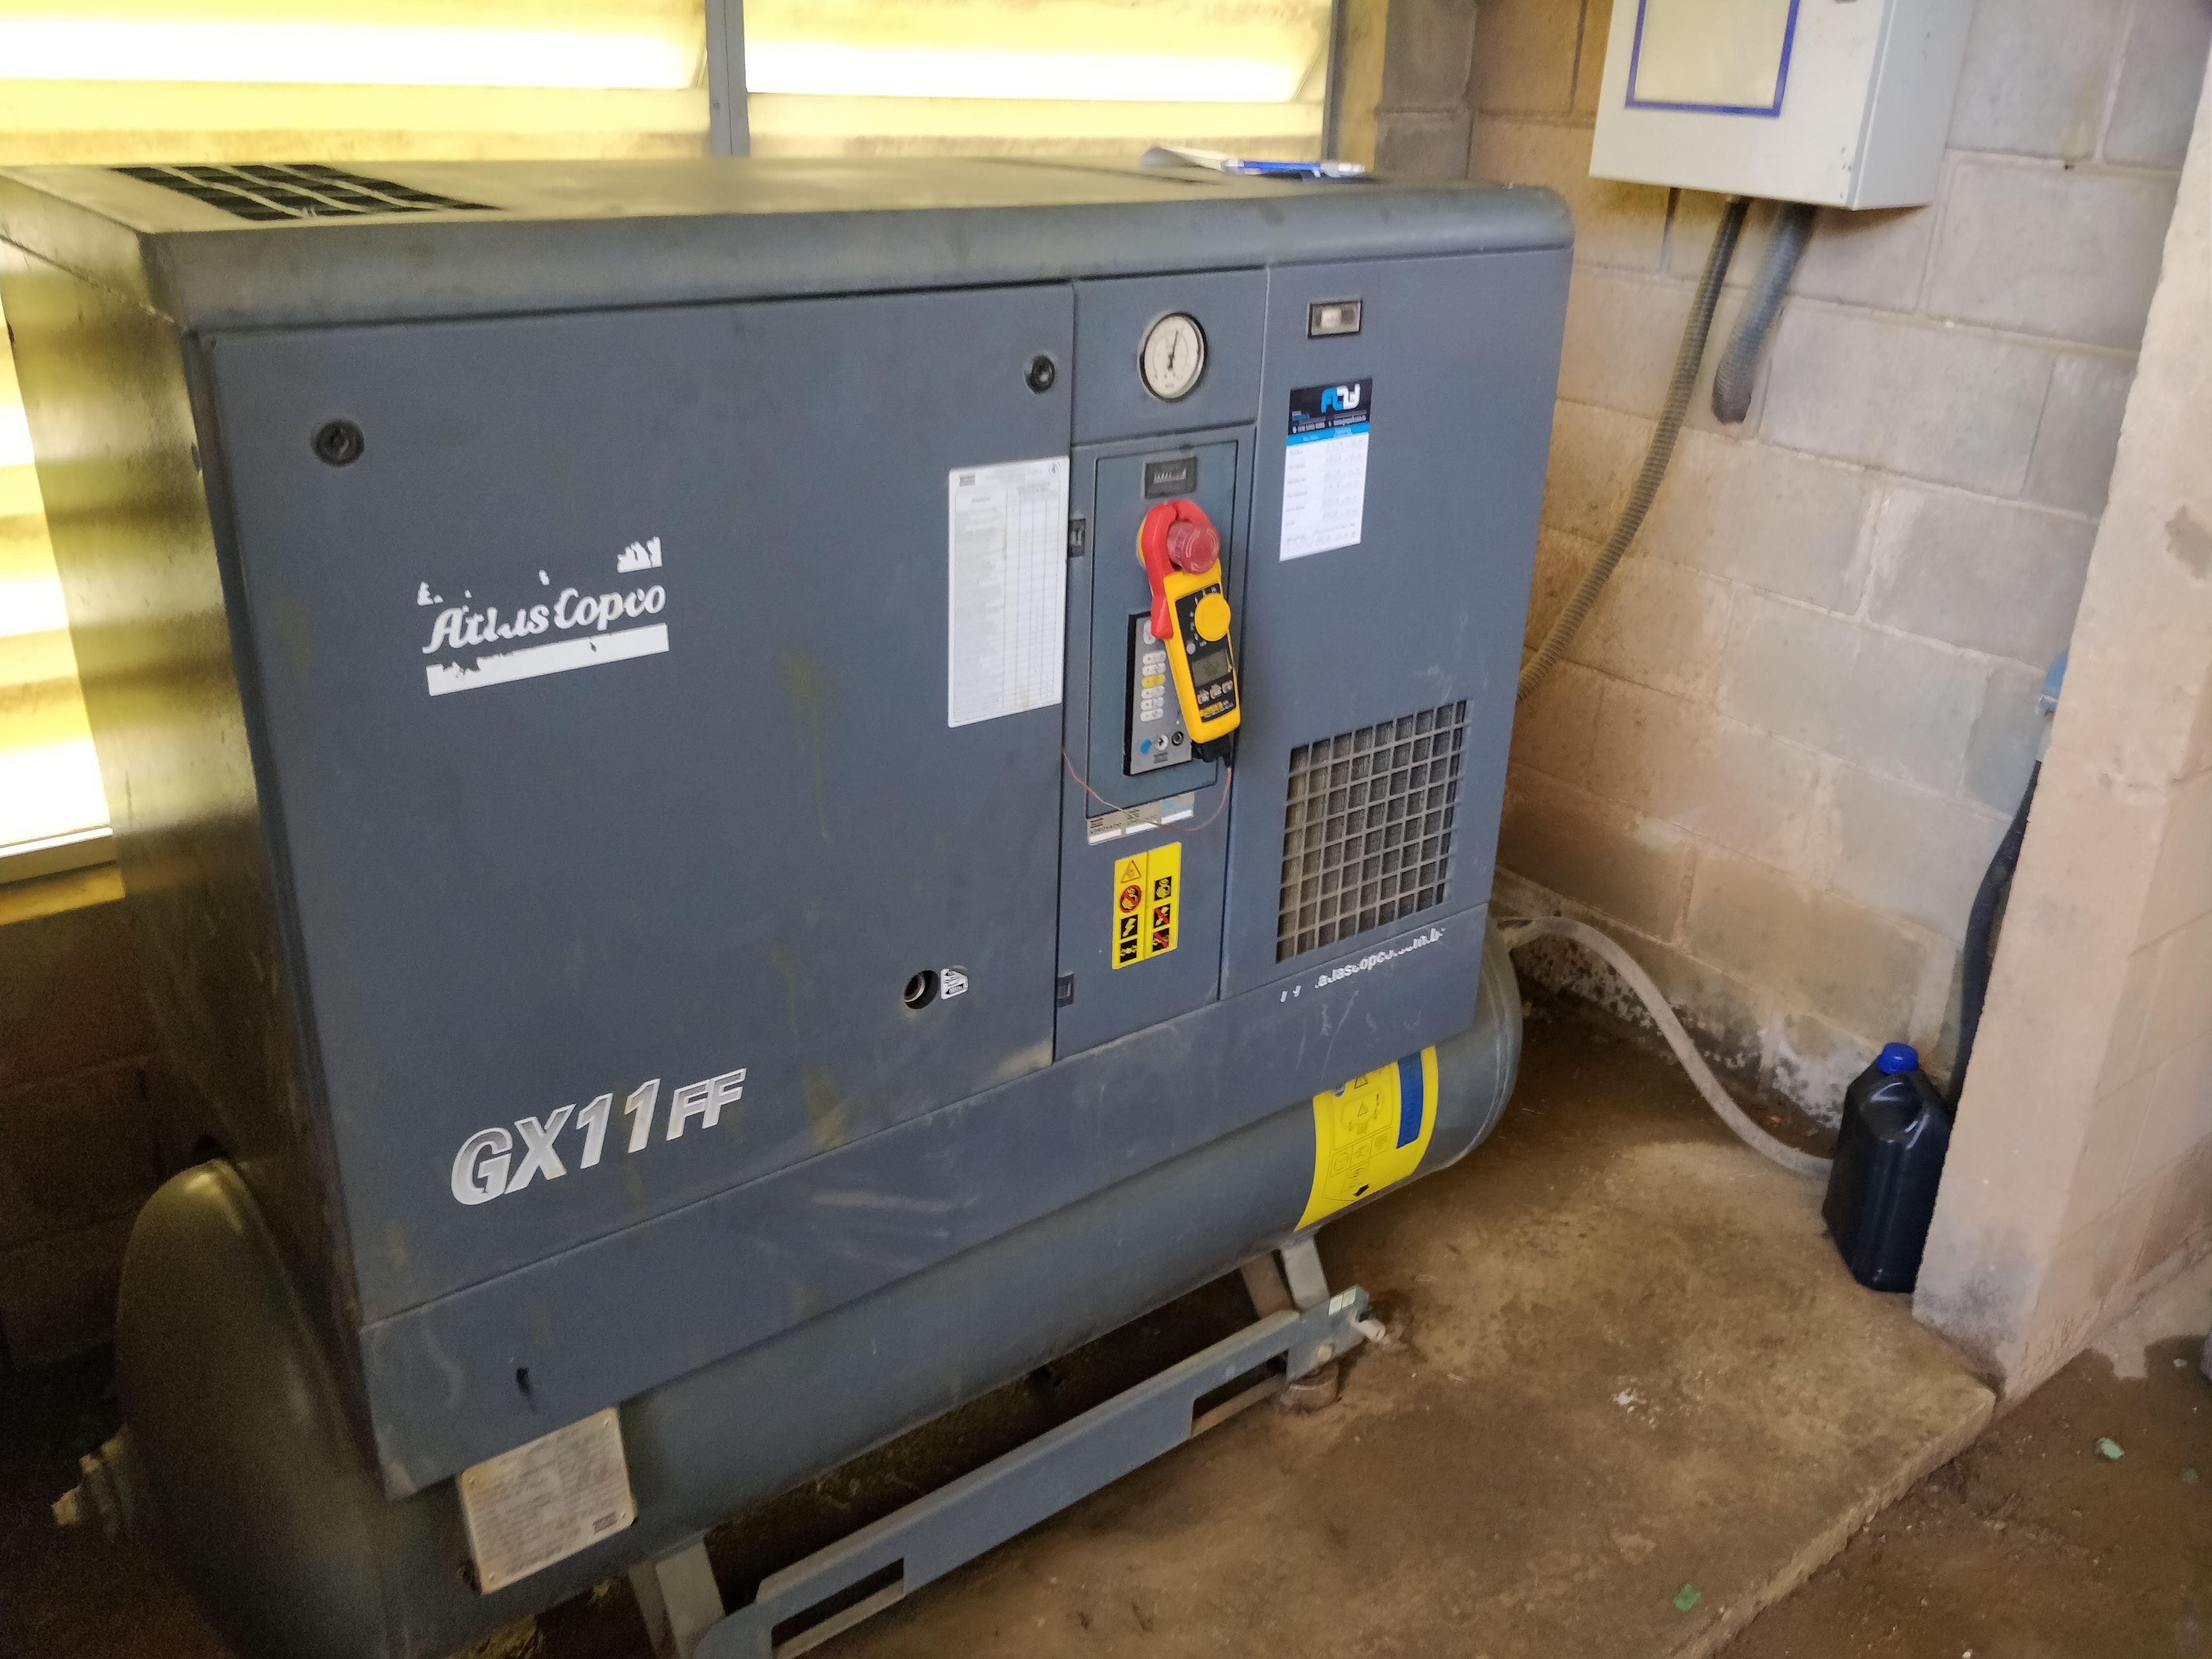 Compressor parafuso GX 11 FF